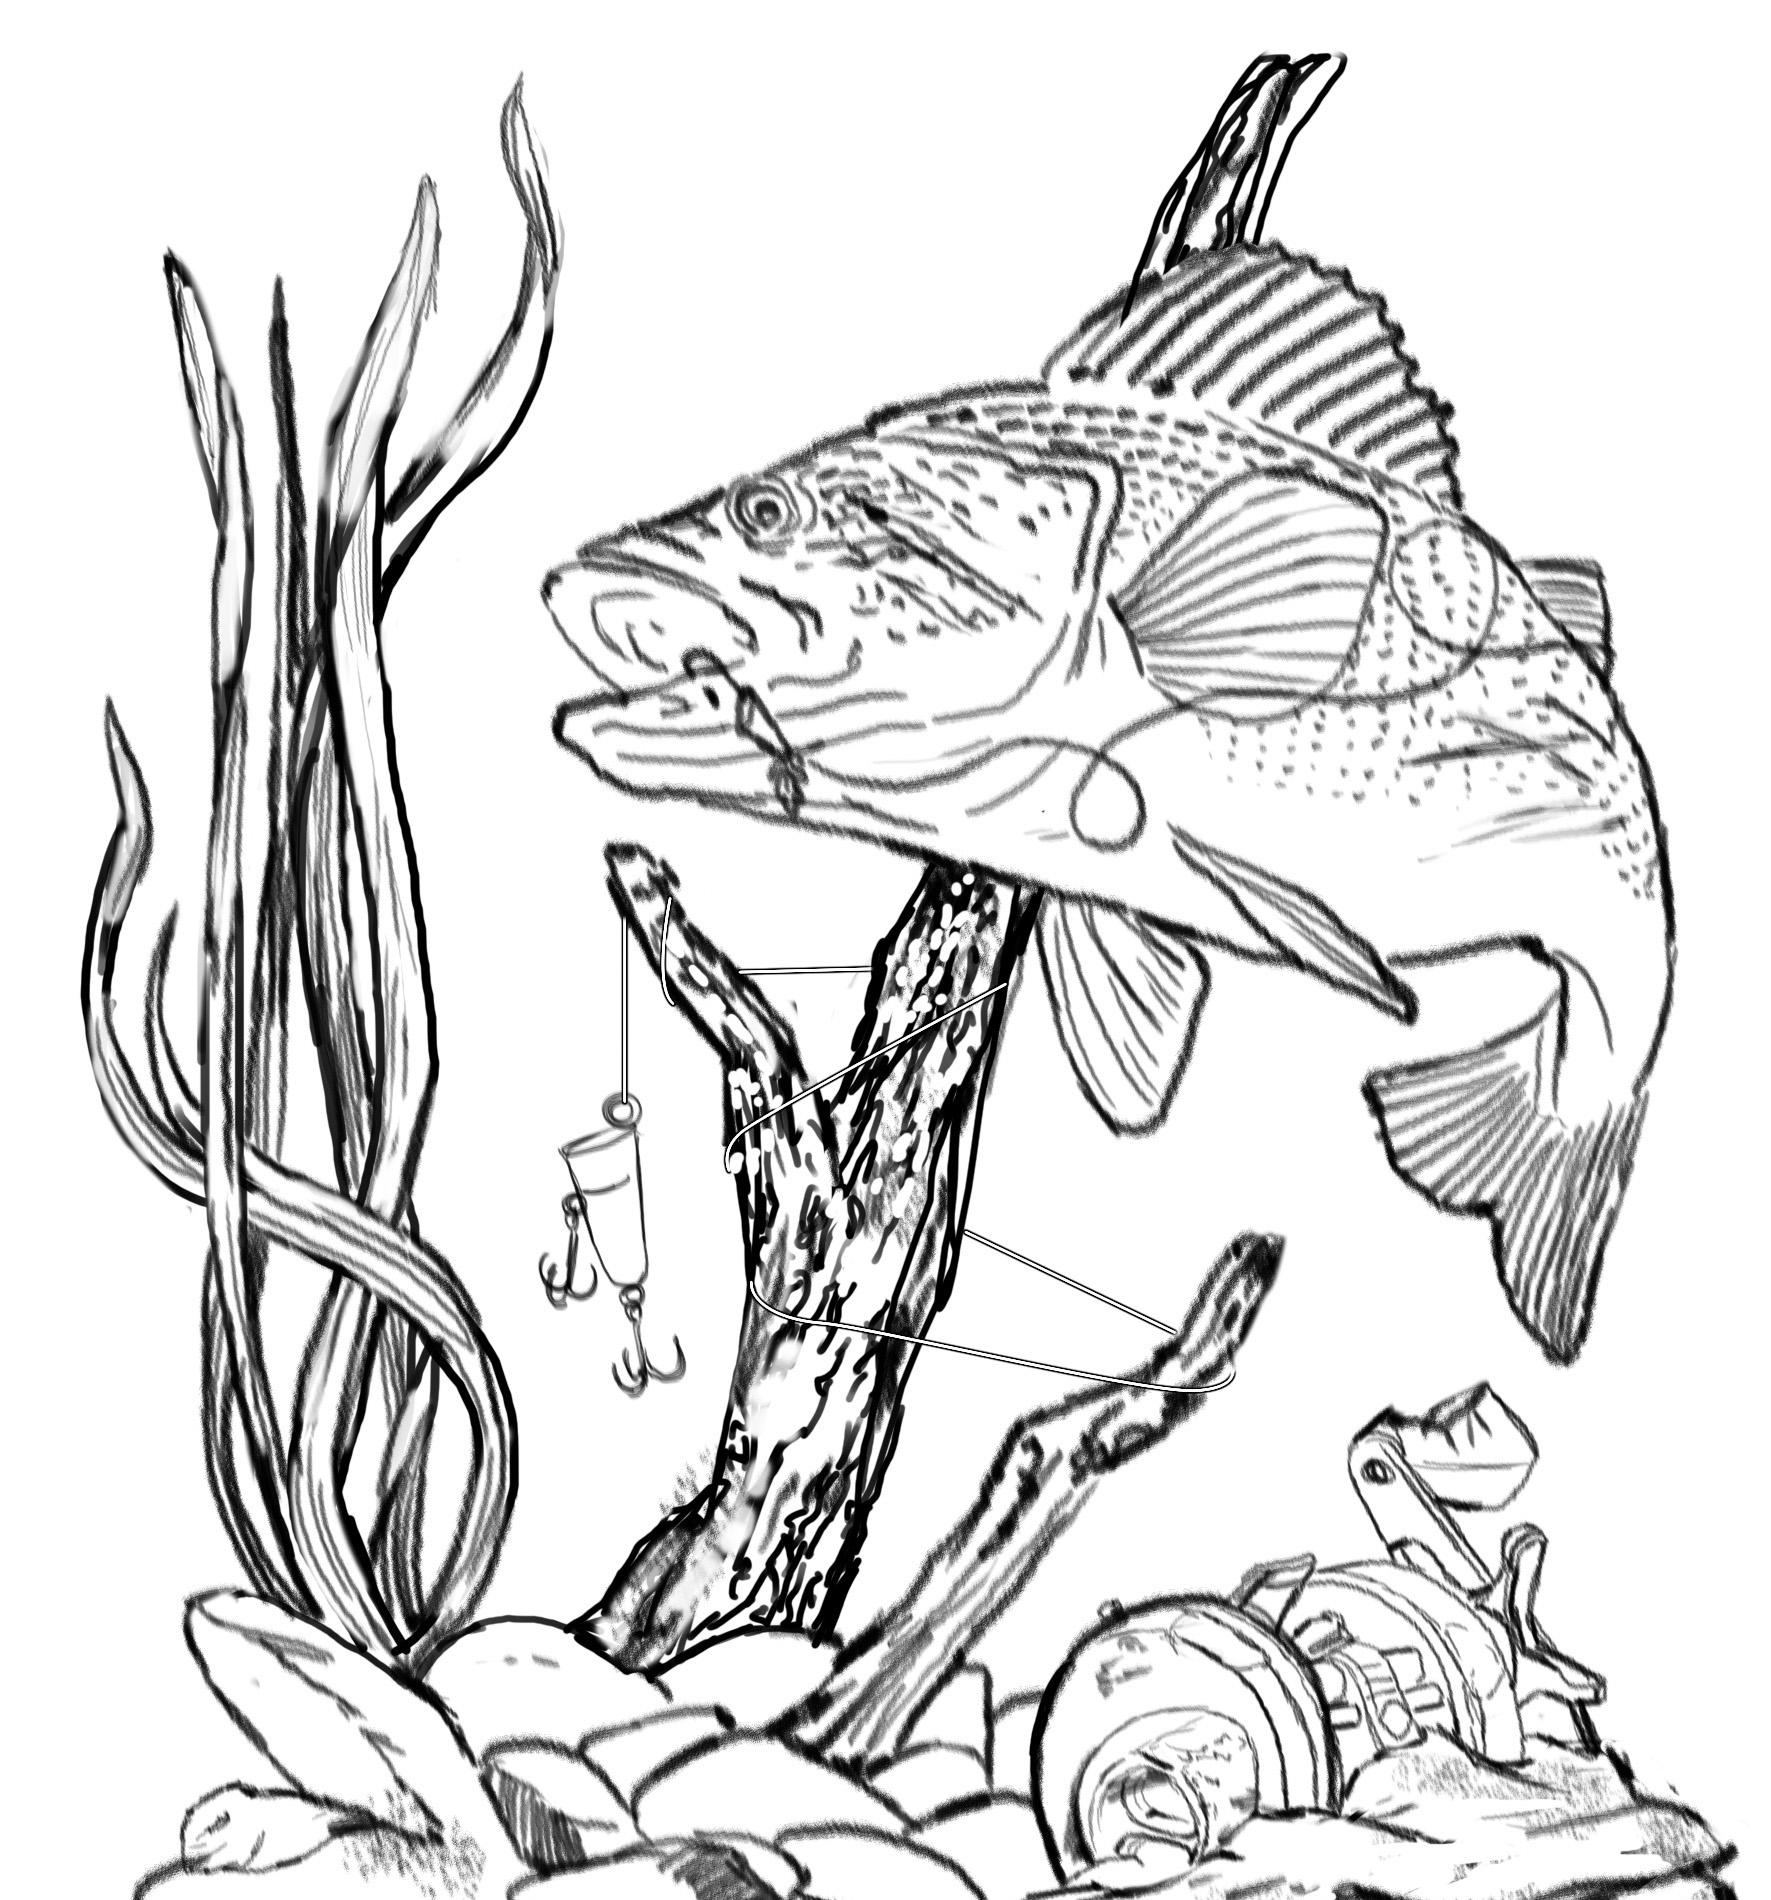 Bass Fish Png - ClipArt Best